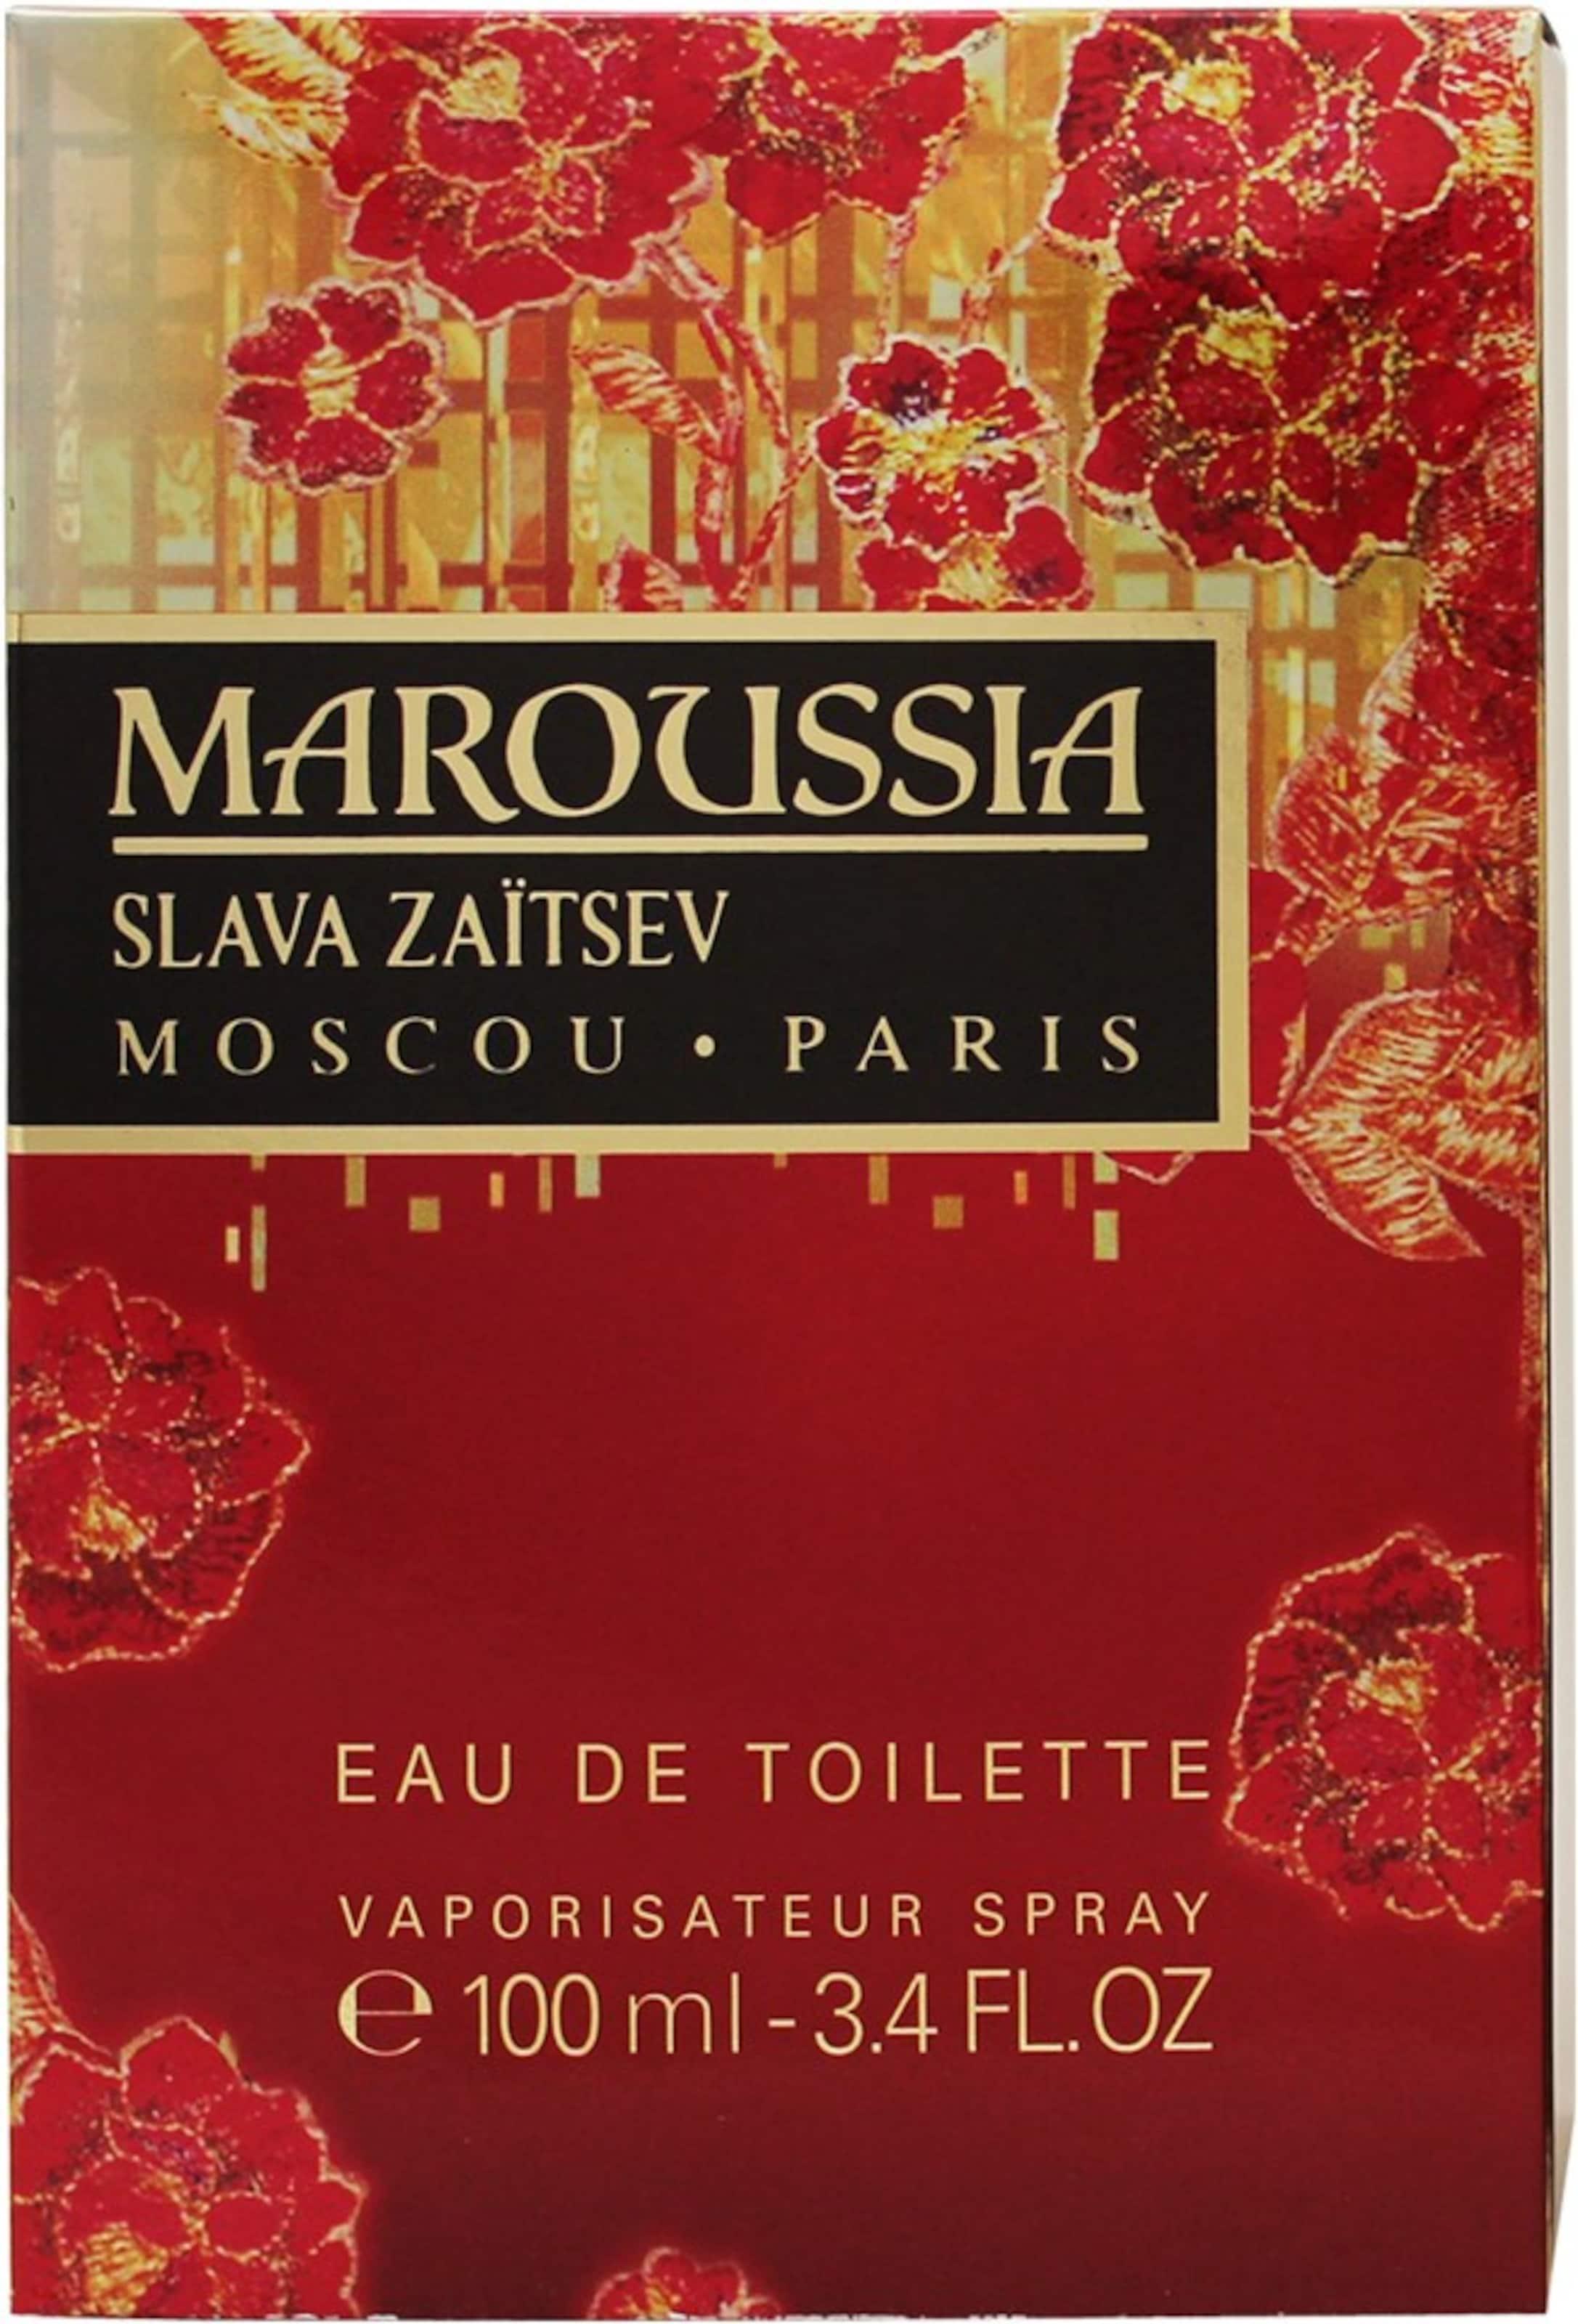 Slava Zaitsev 'Maroussia', Eau de Toilette